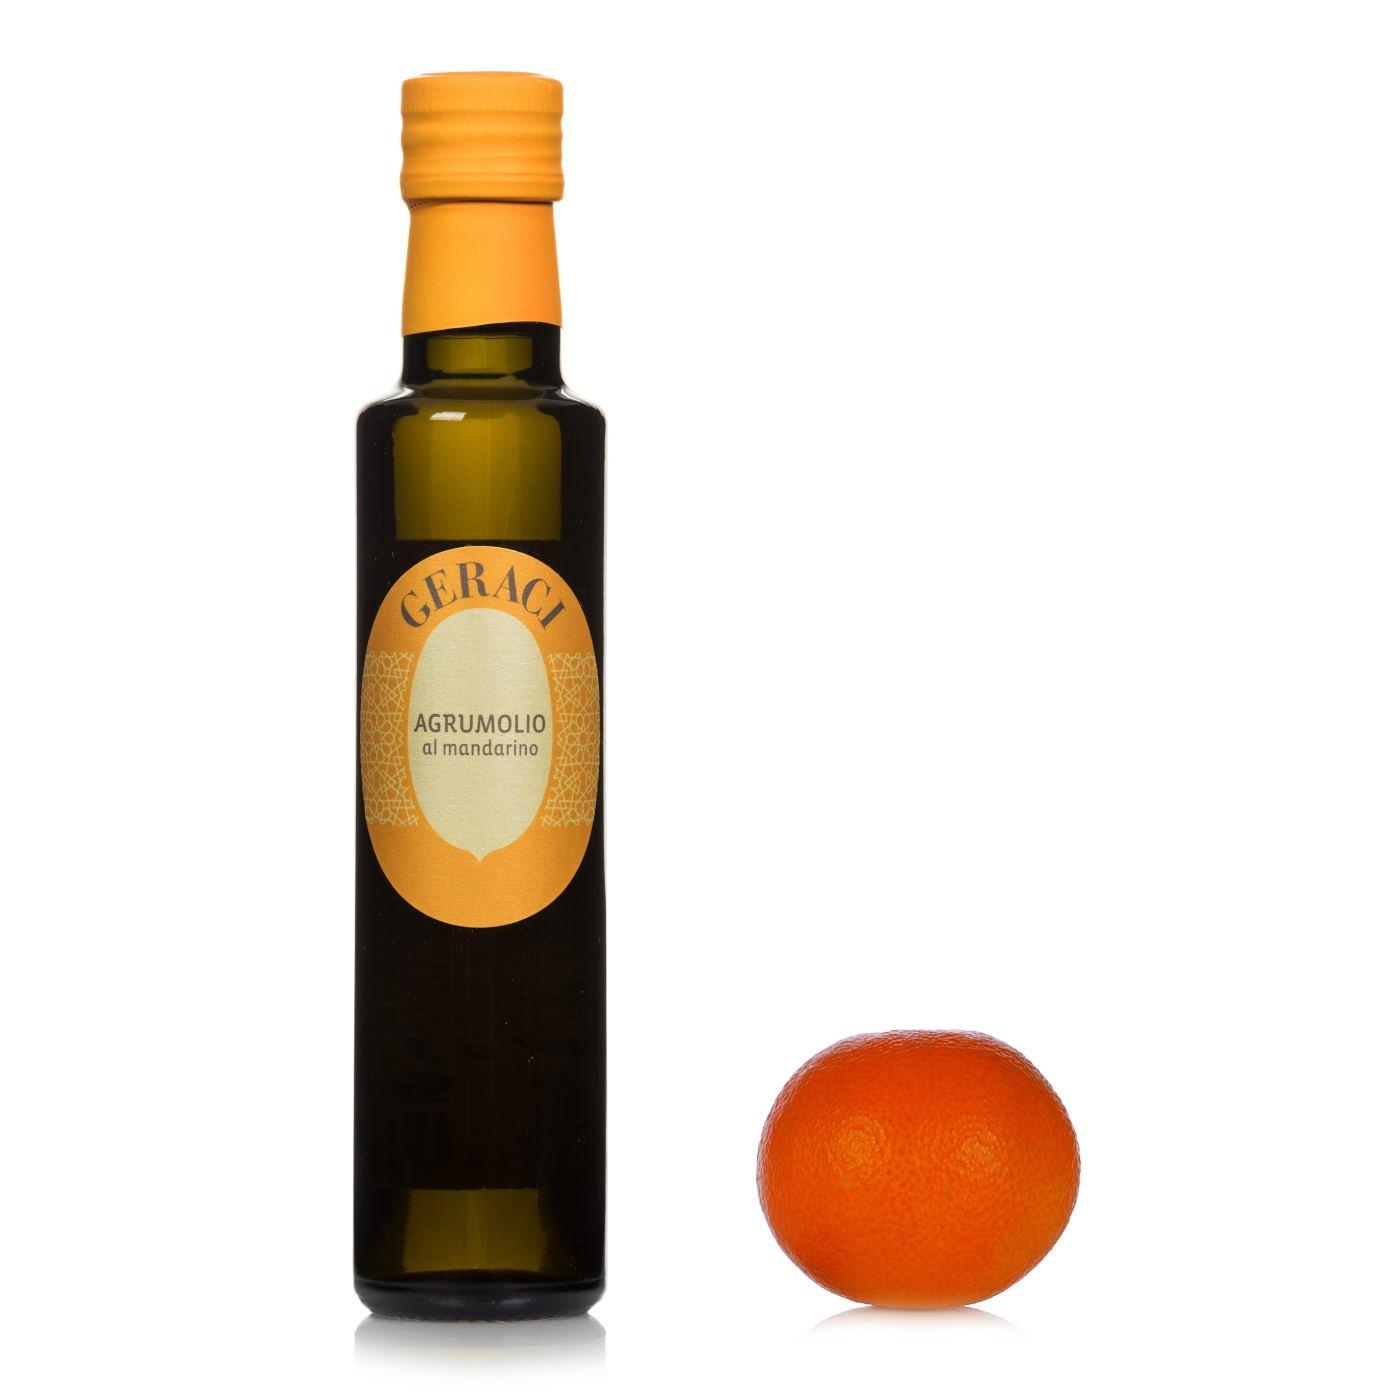 Azienda agricola Geraci AGRUMOLIO  tangerine 250 ml AGOL03 Geraci